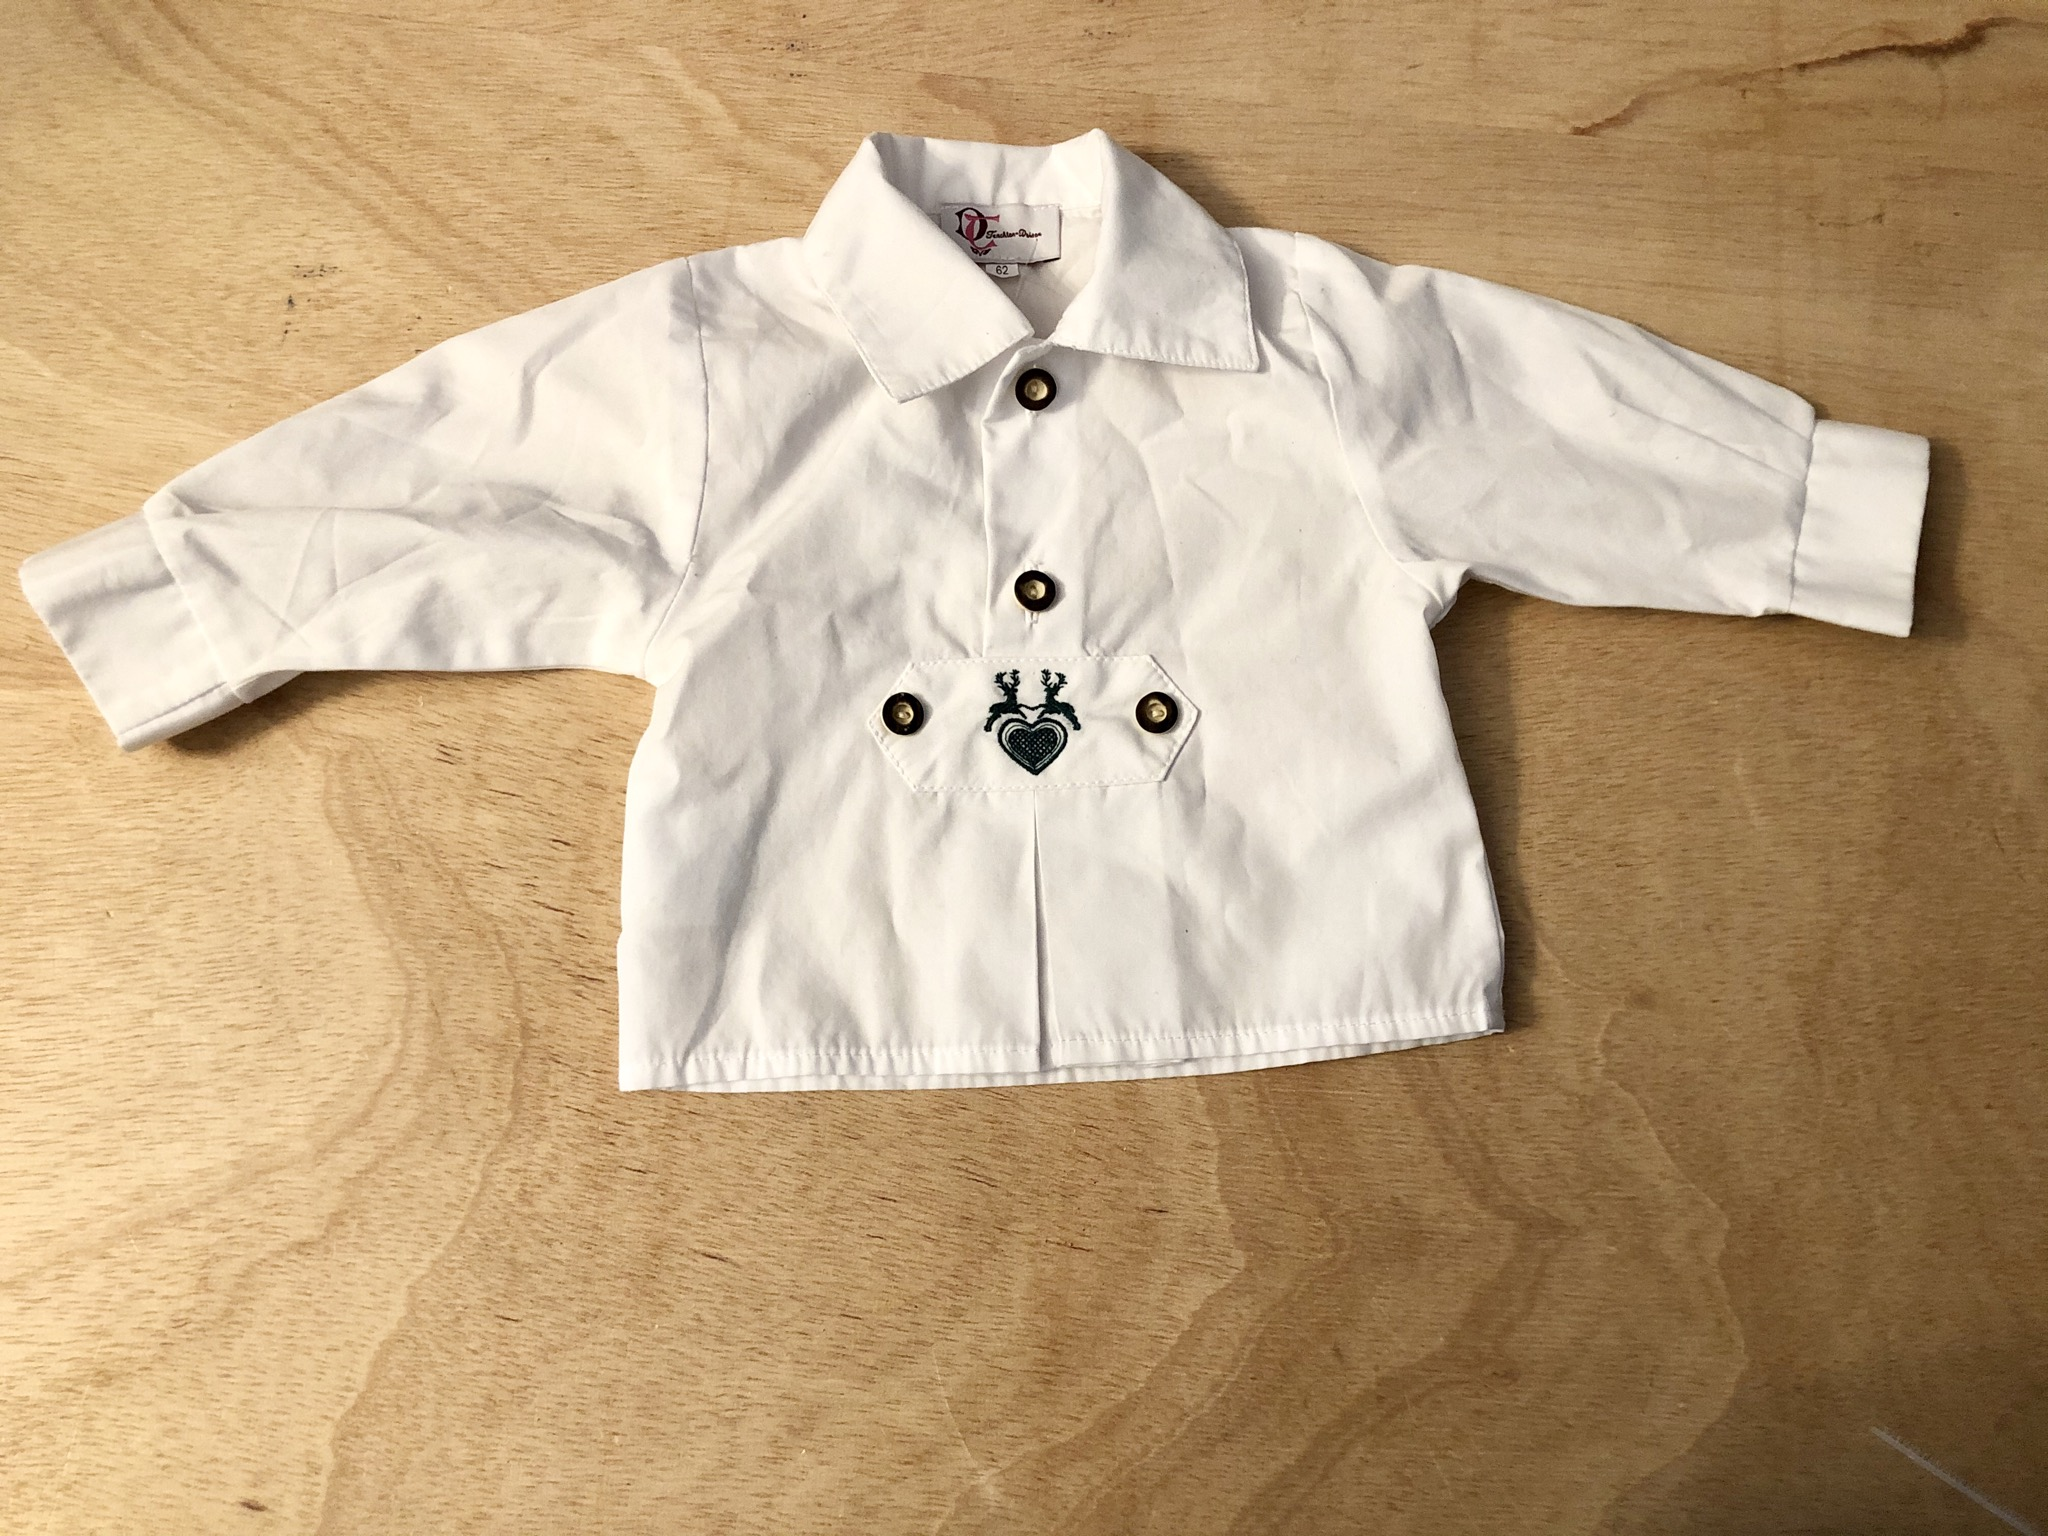 Gr. 62 Trachtenhemd Trachten Deiser